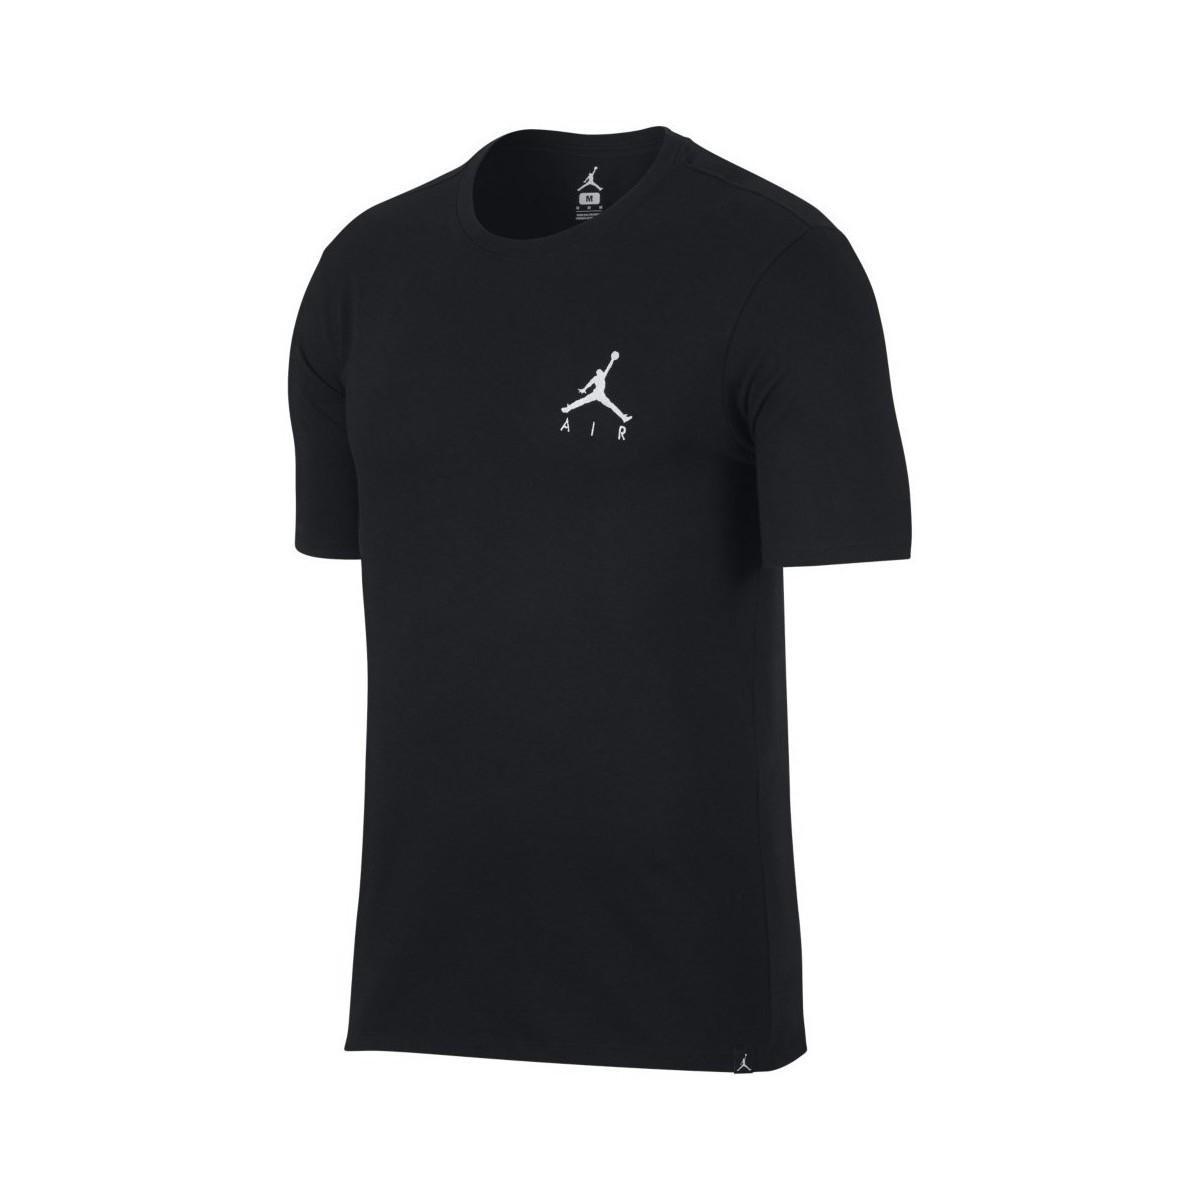 31a56ea52b Nike Air Jordan Jumpman Embroidered Tee Men's T Shirt In Black in ...